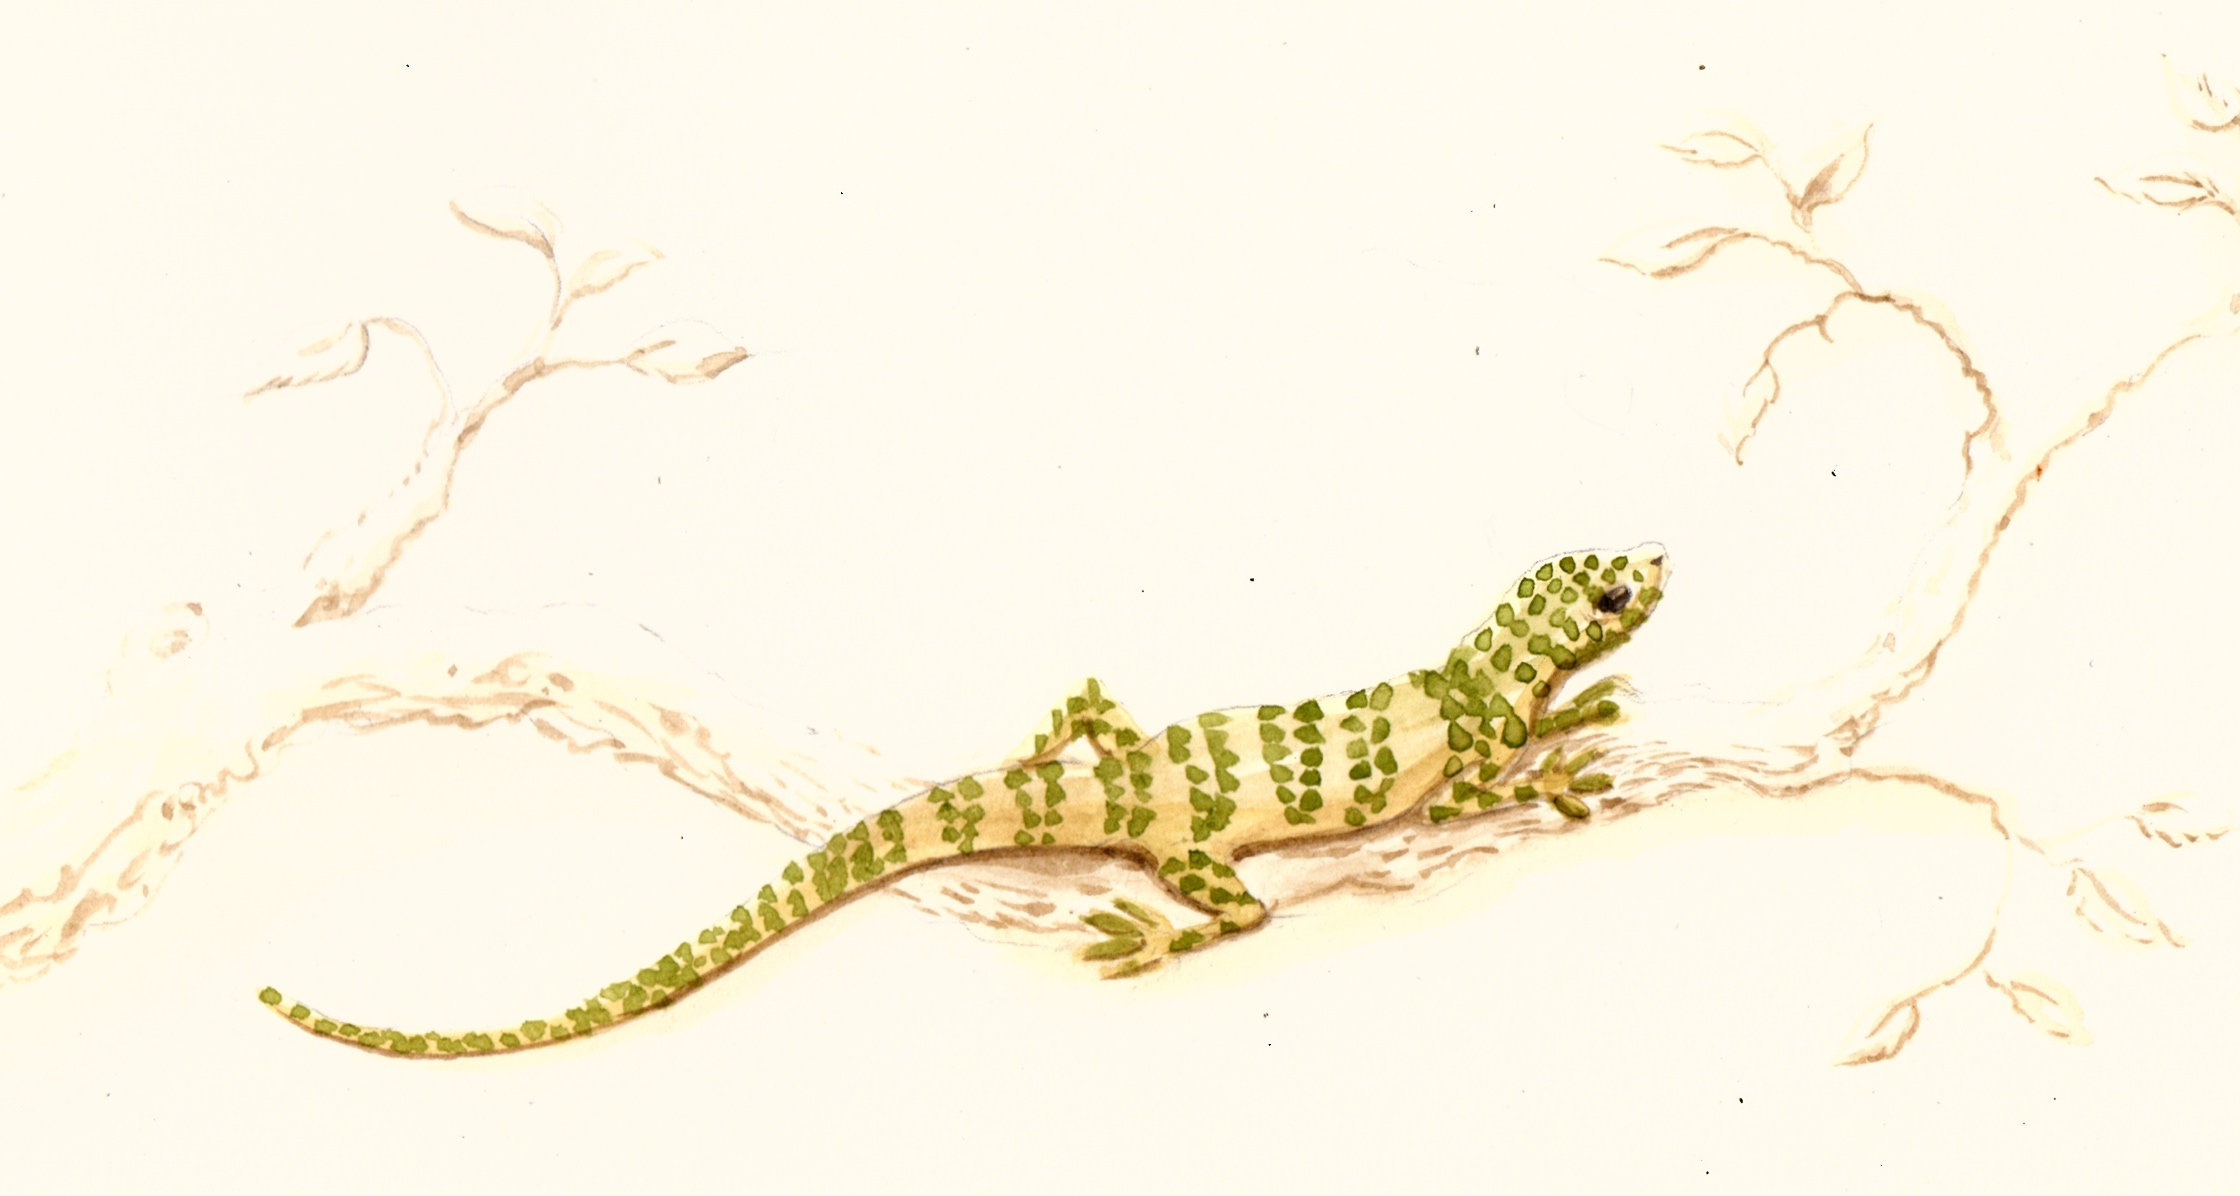 sketch for a lizard